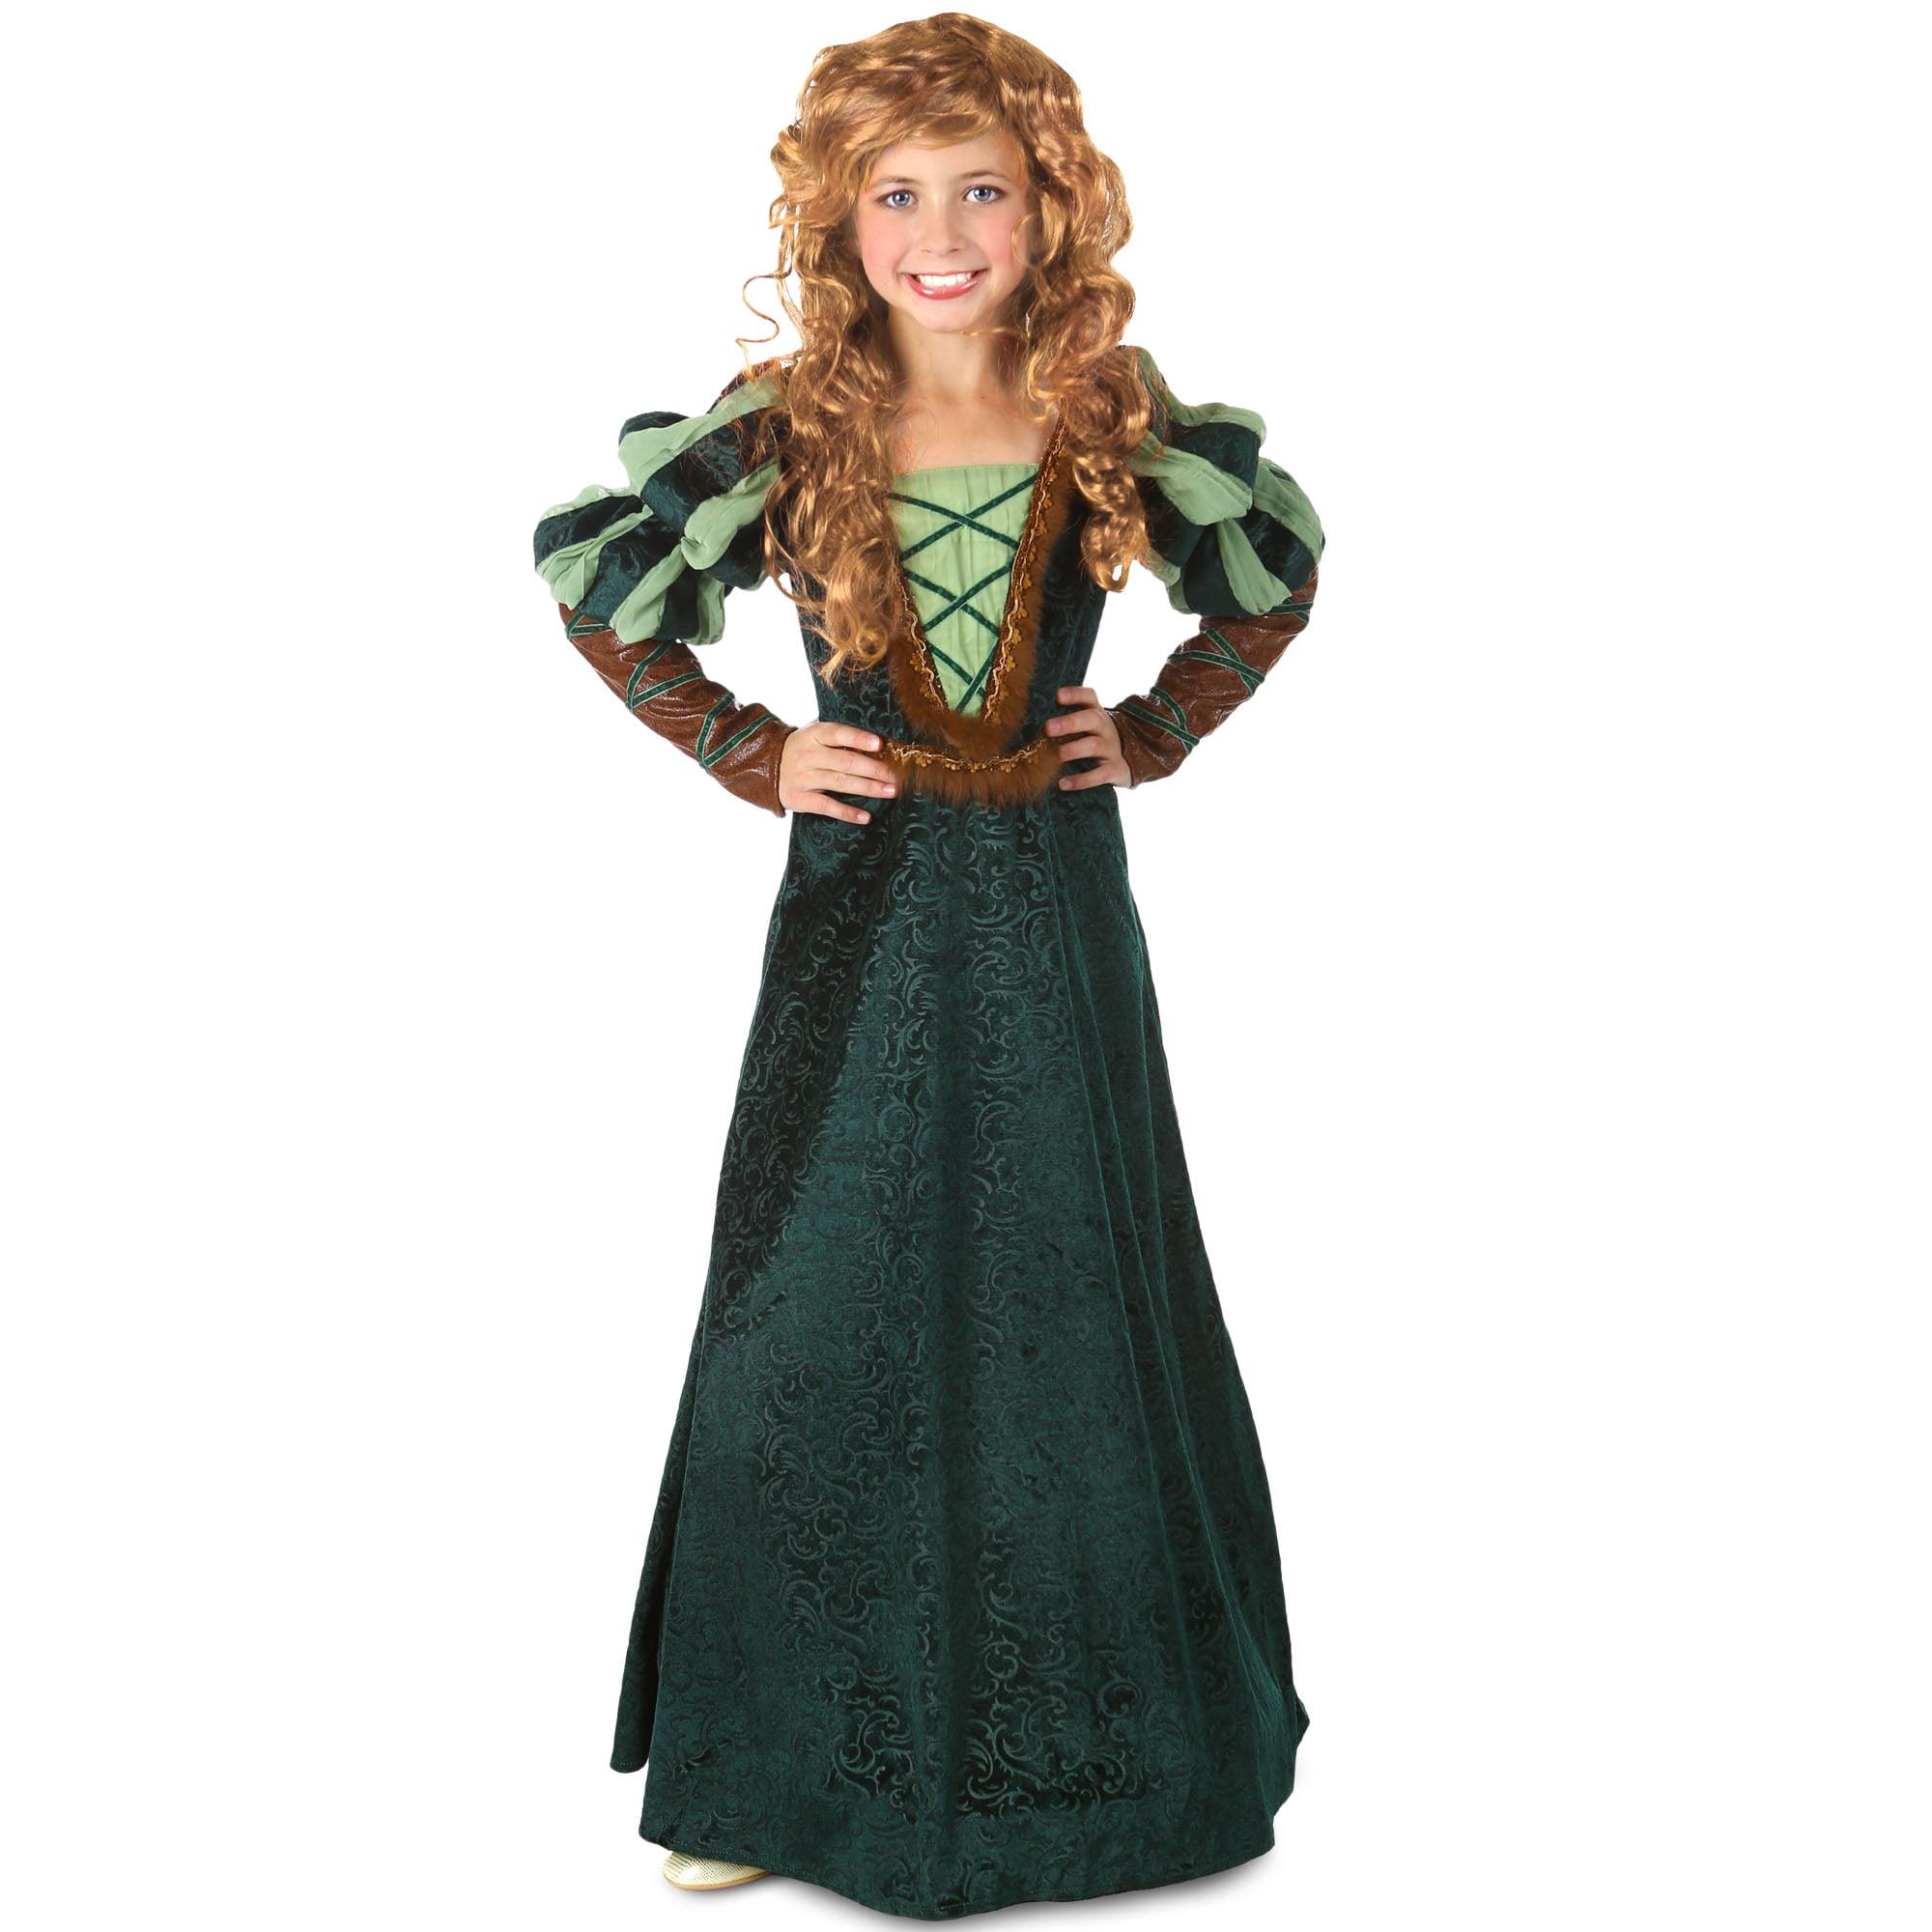 Princess Paradise Premium Forest Princess Child Costume